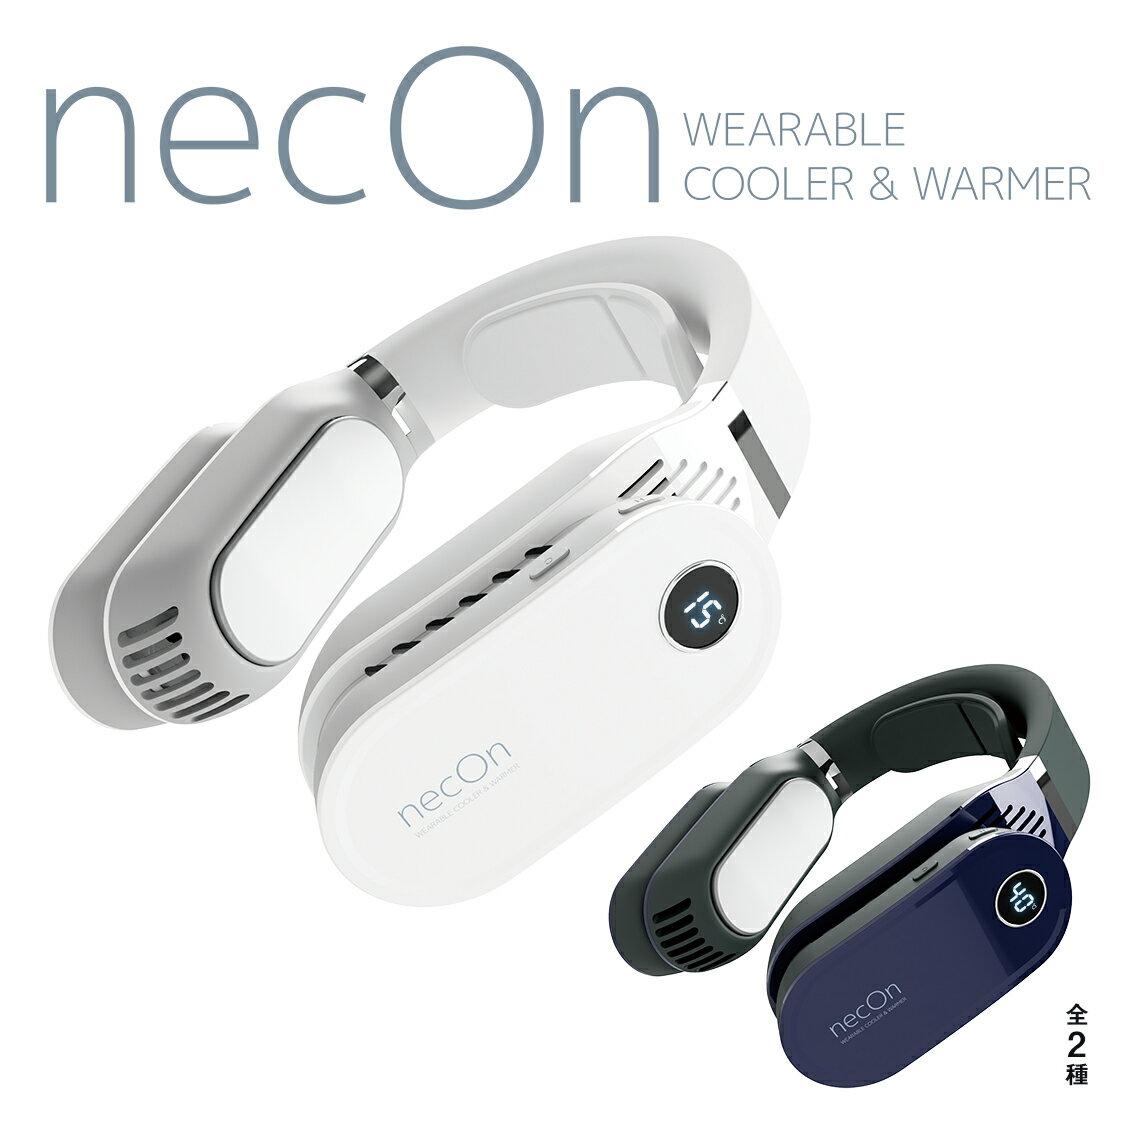 necOn WEARABLE COOLER & WARMER